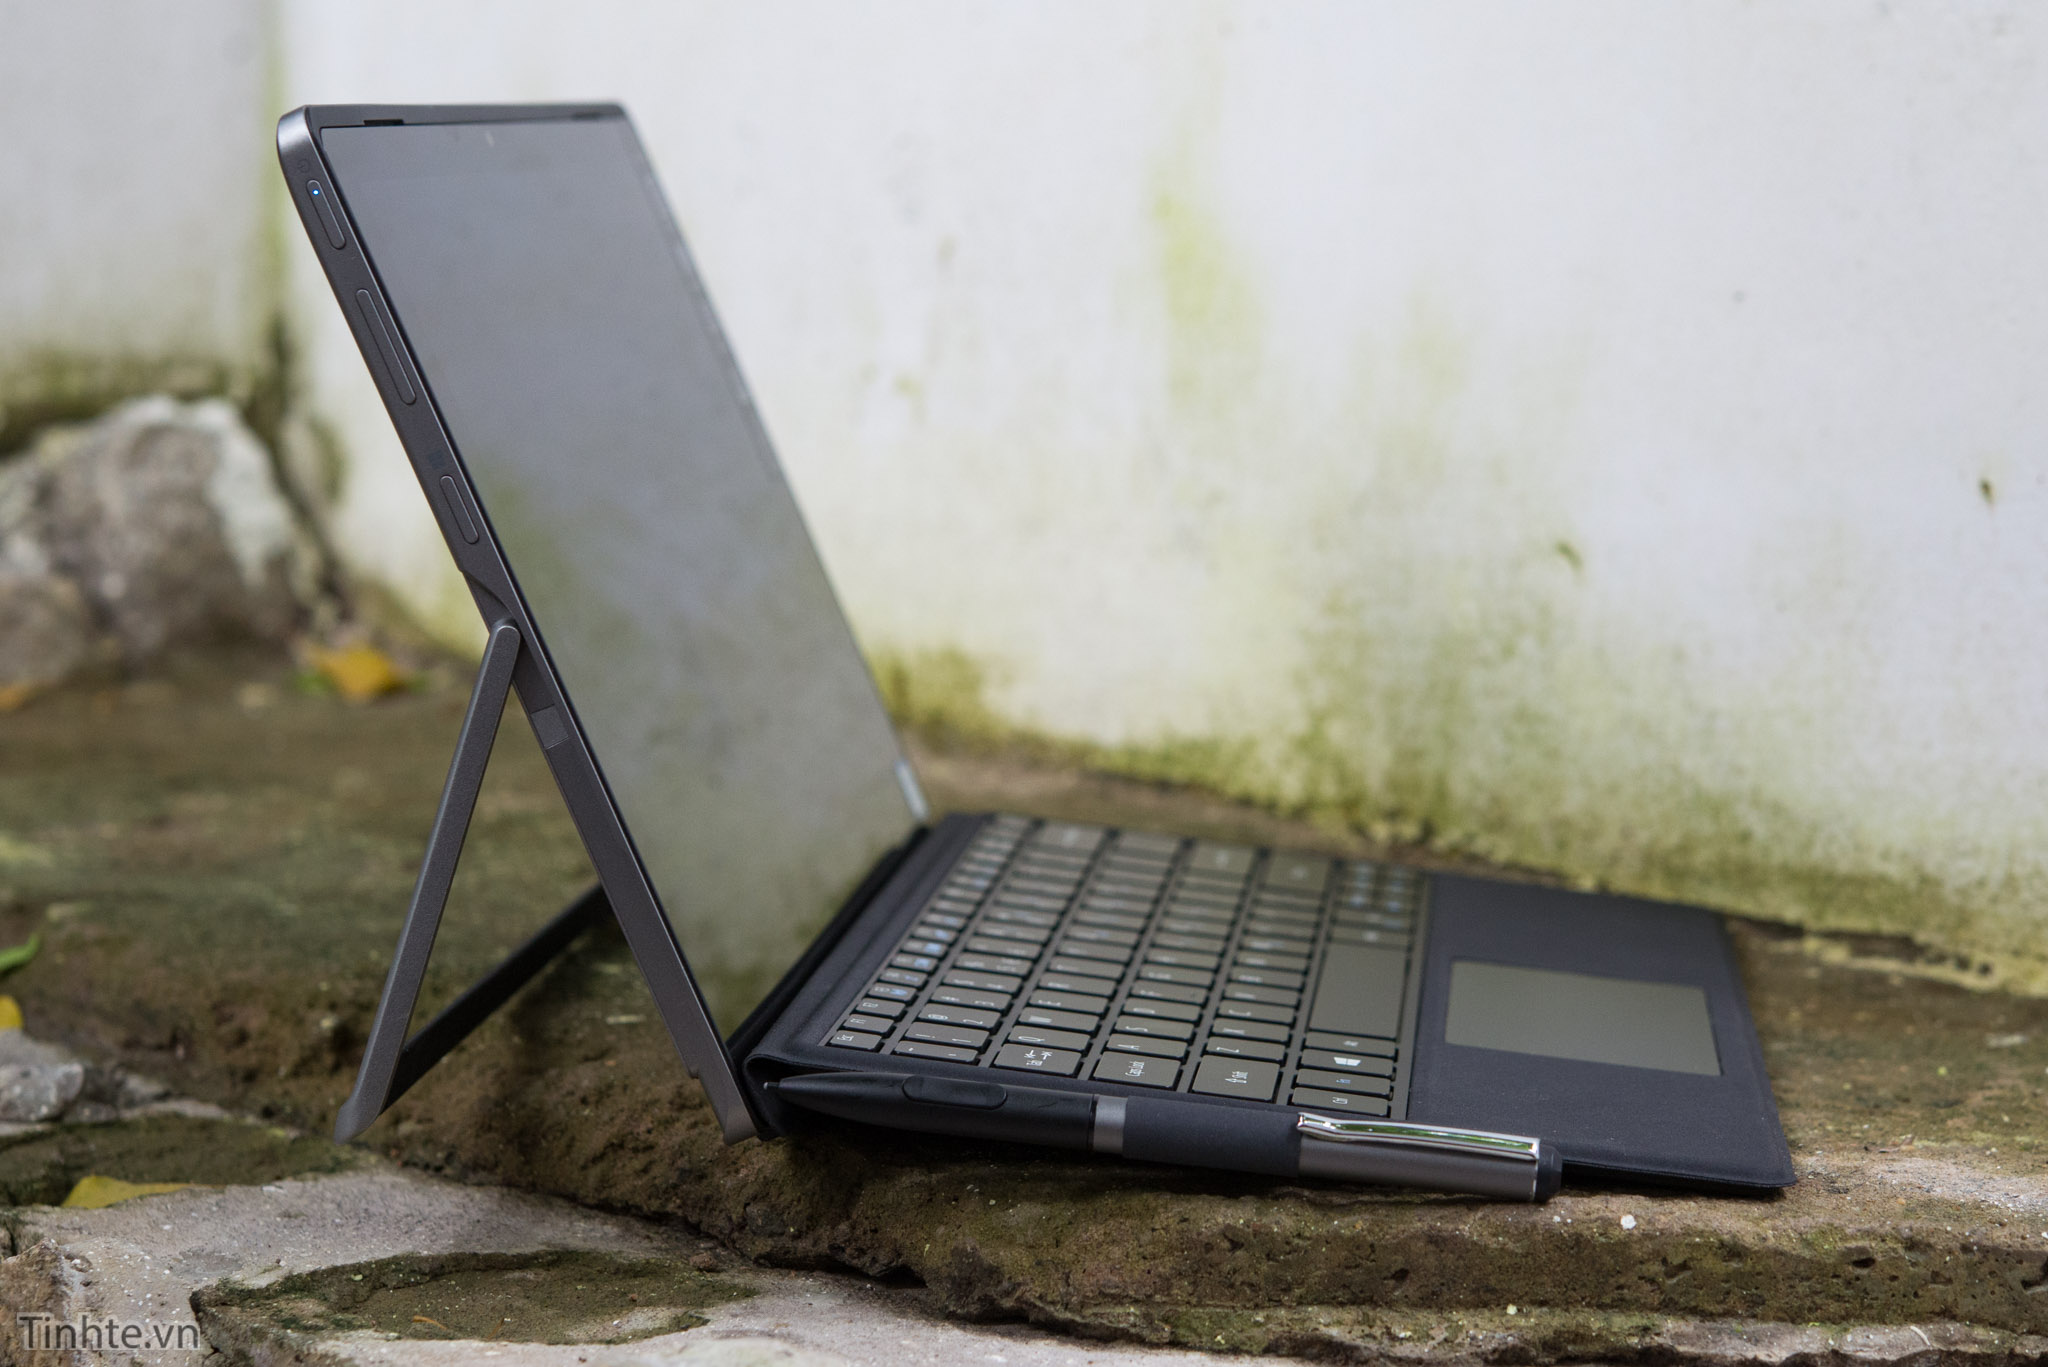 Acer Alpha 12_tinhte.vn 2.jpg